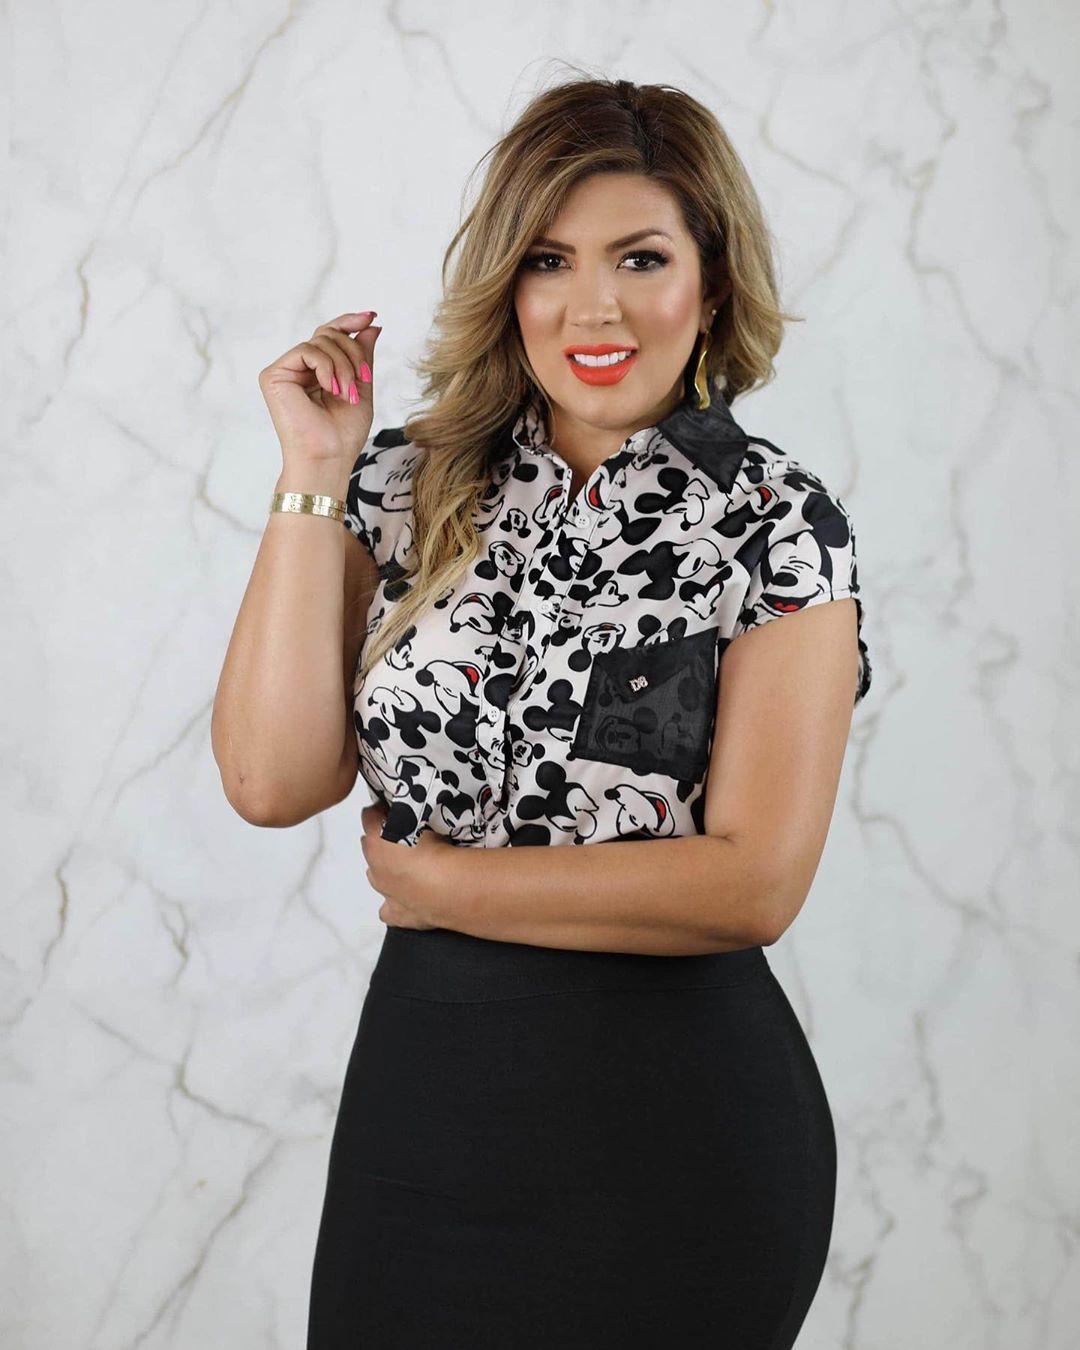 Tumblr in 2020 Latina fashion, Utah fashion, Fashion